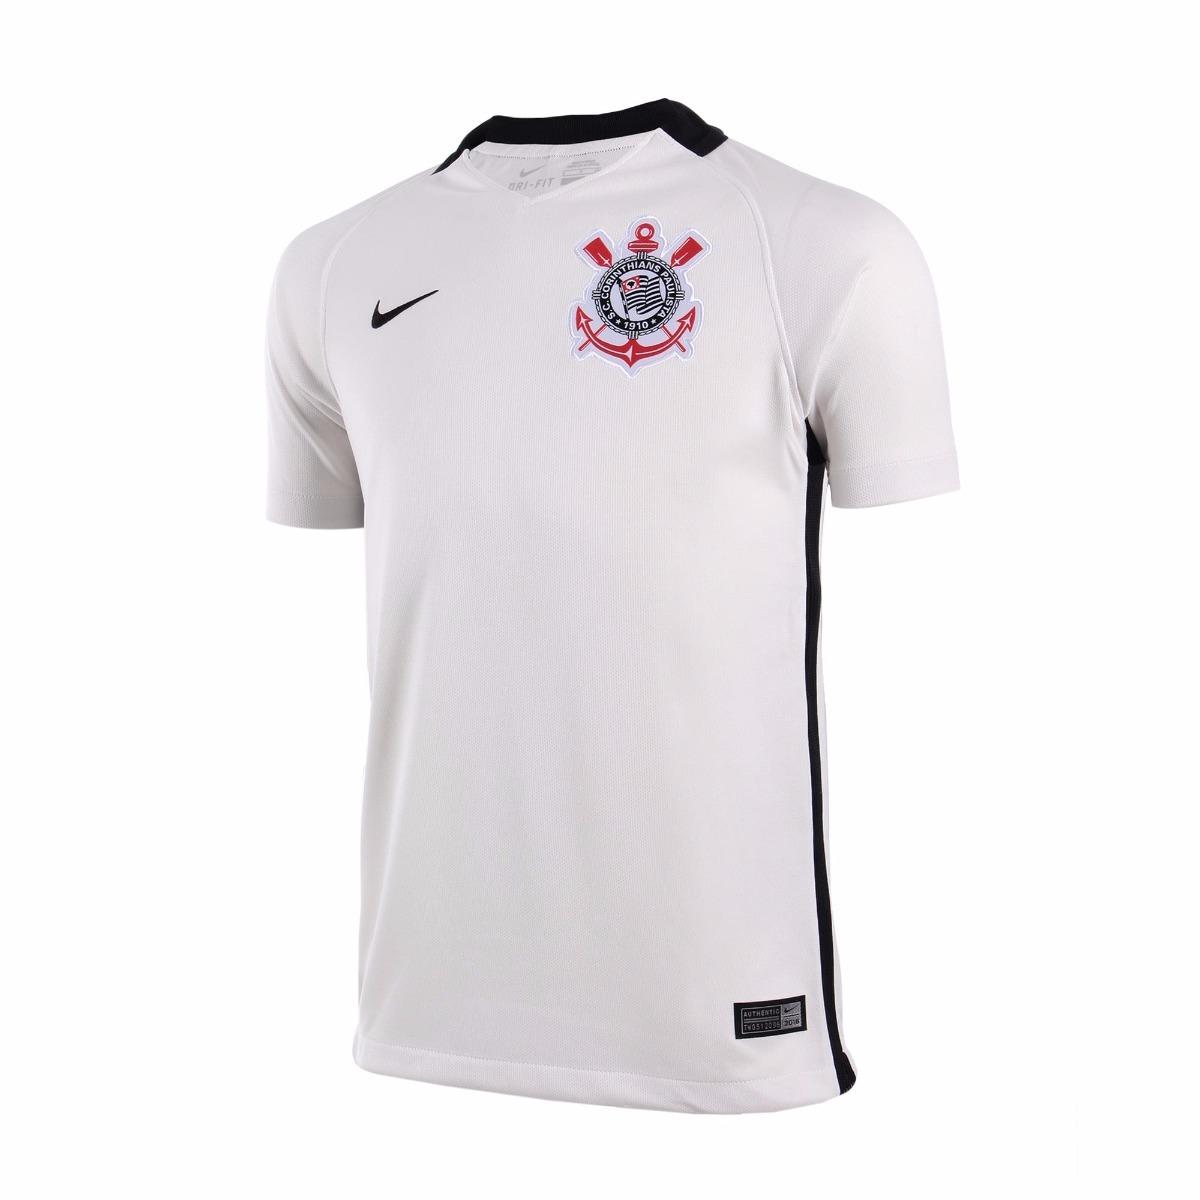 camisa corinthians infantil 2016 branca nike - footlet. Carregando zoom. a98e3bd94c09d